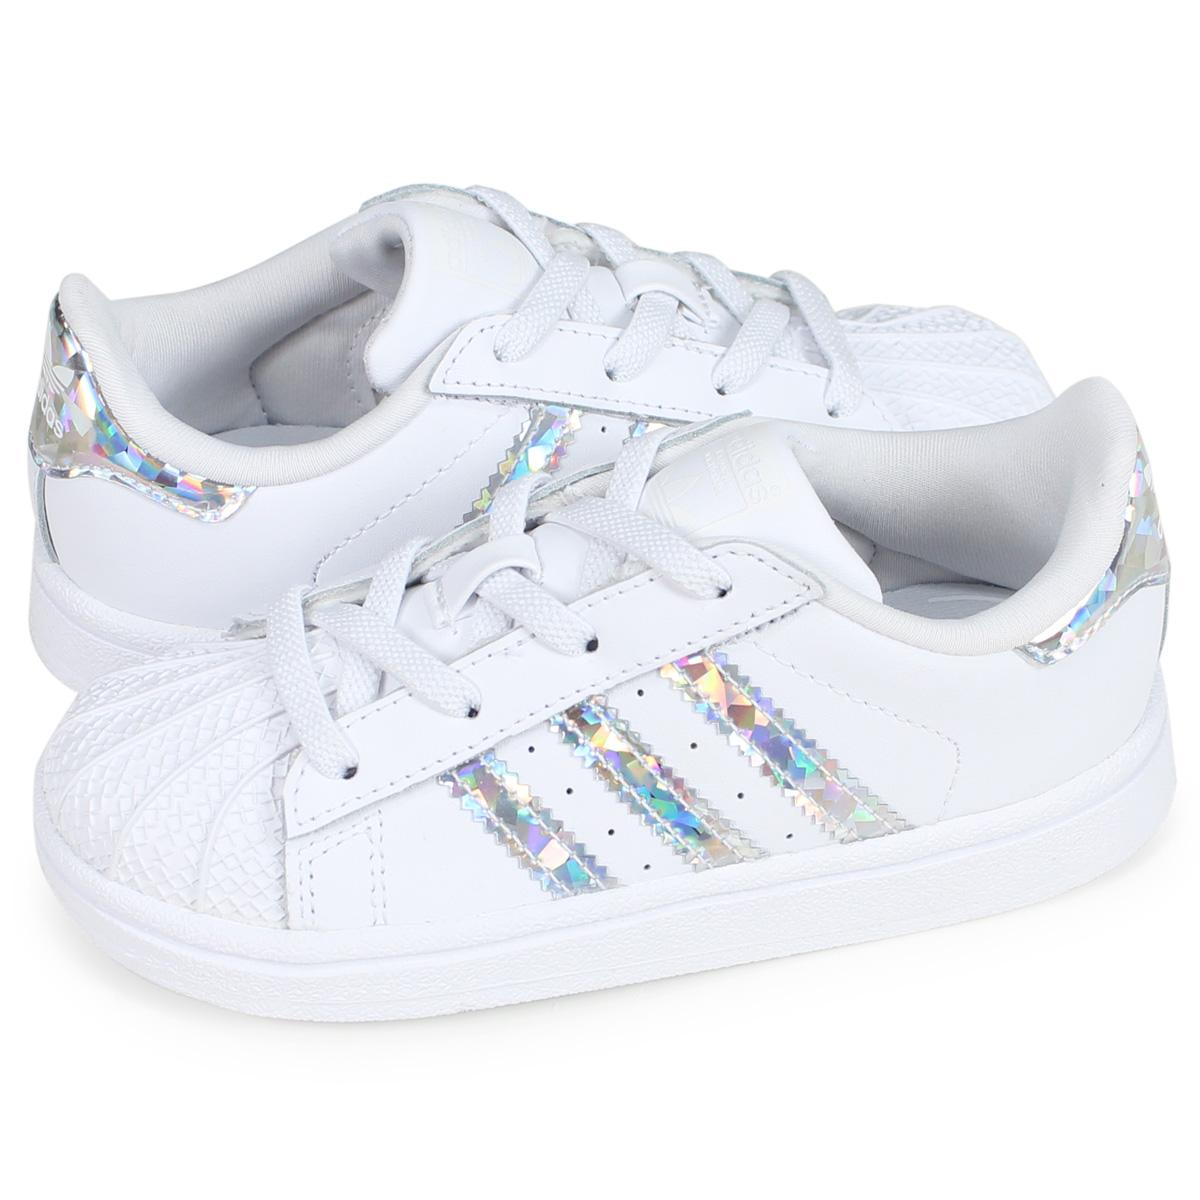 adidas Originals SUPER STAR EL I Adidas originals superstar sneakers baby white CG6707